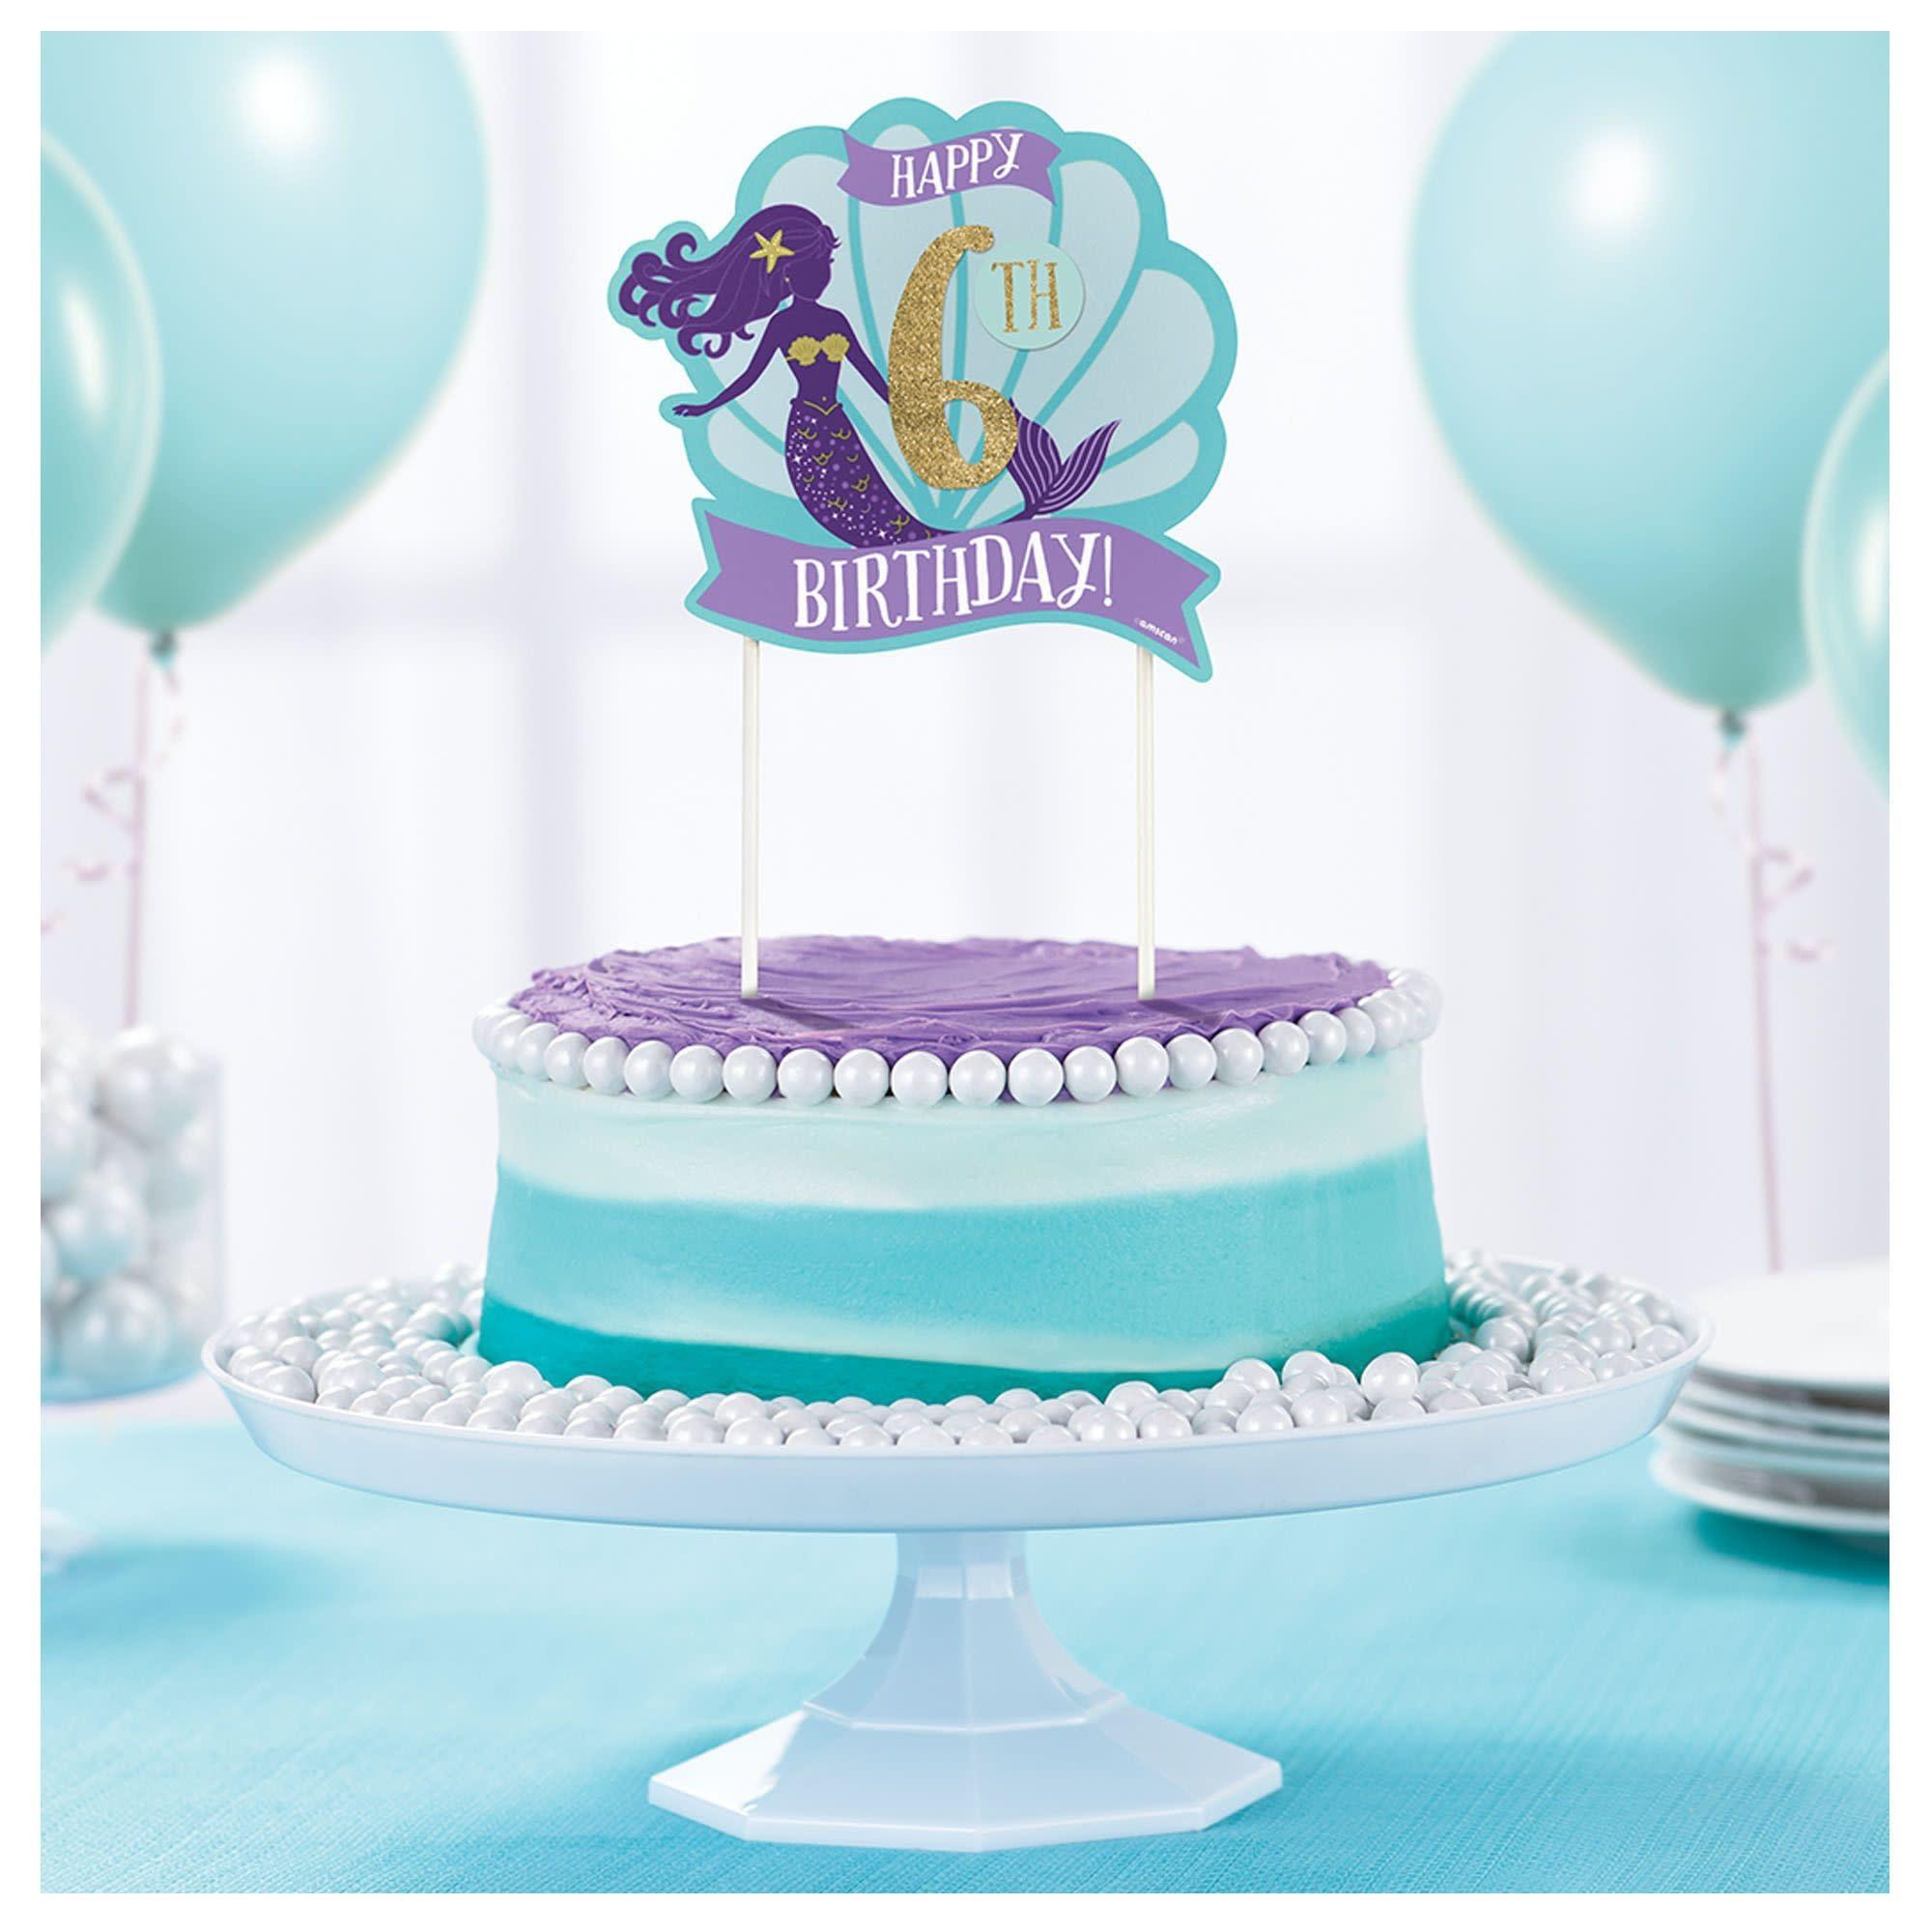 Mermaid Wishes Customizable Cake Decorations